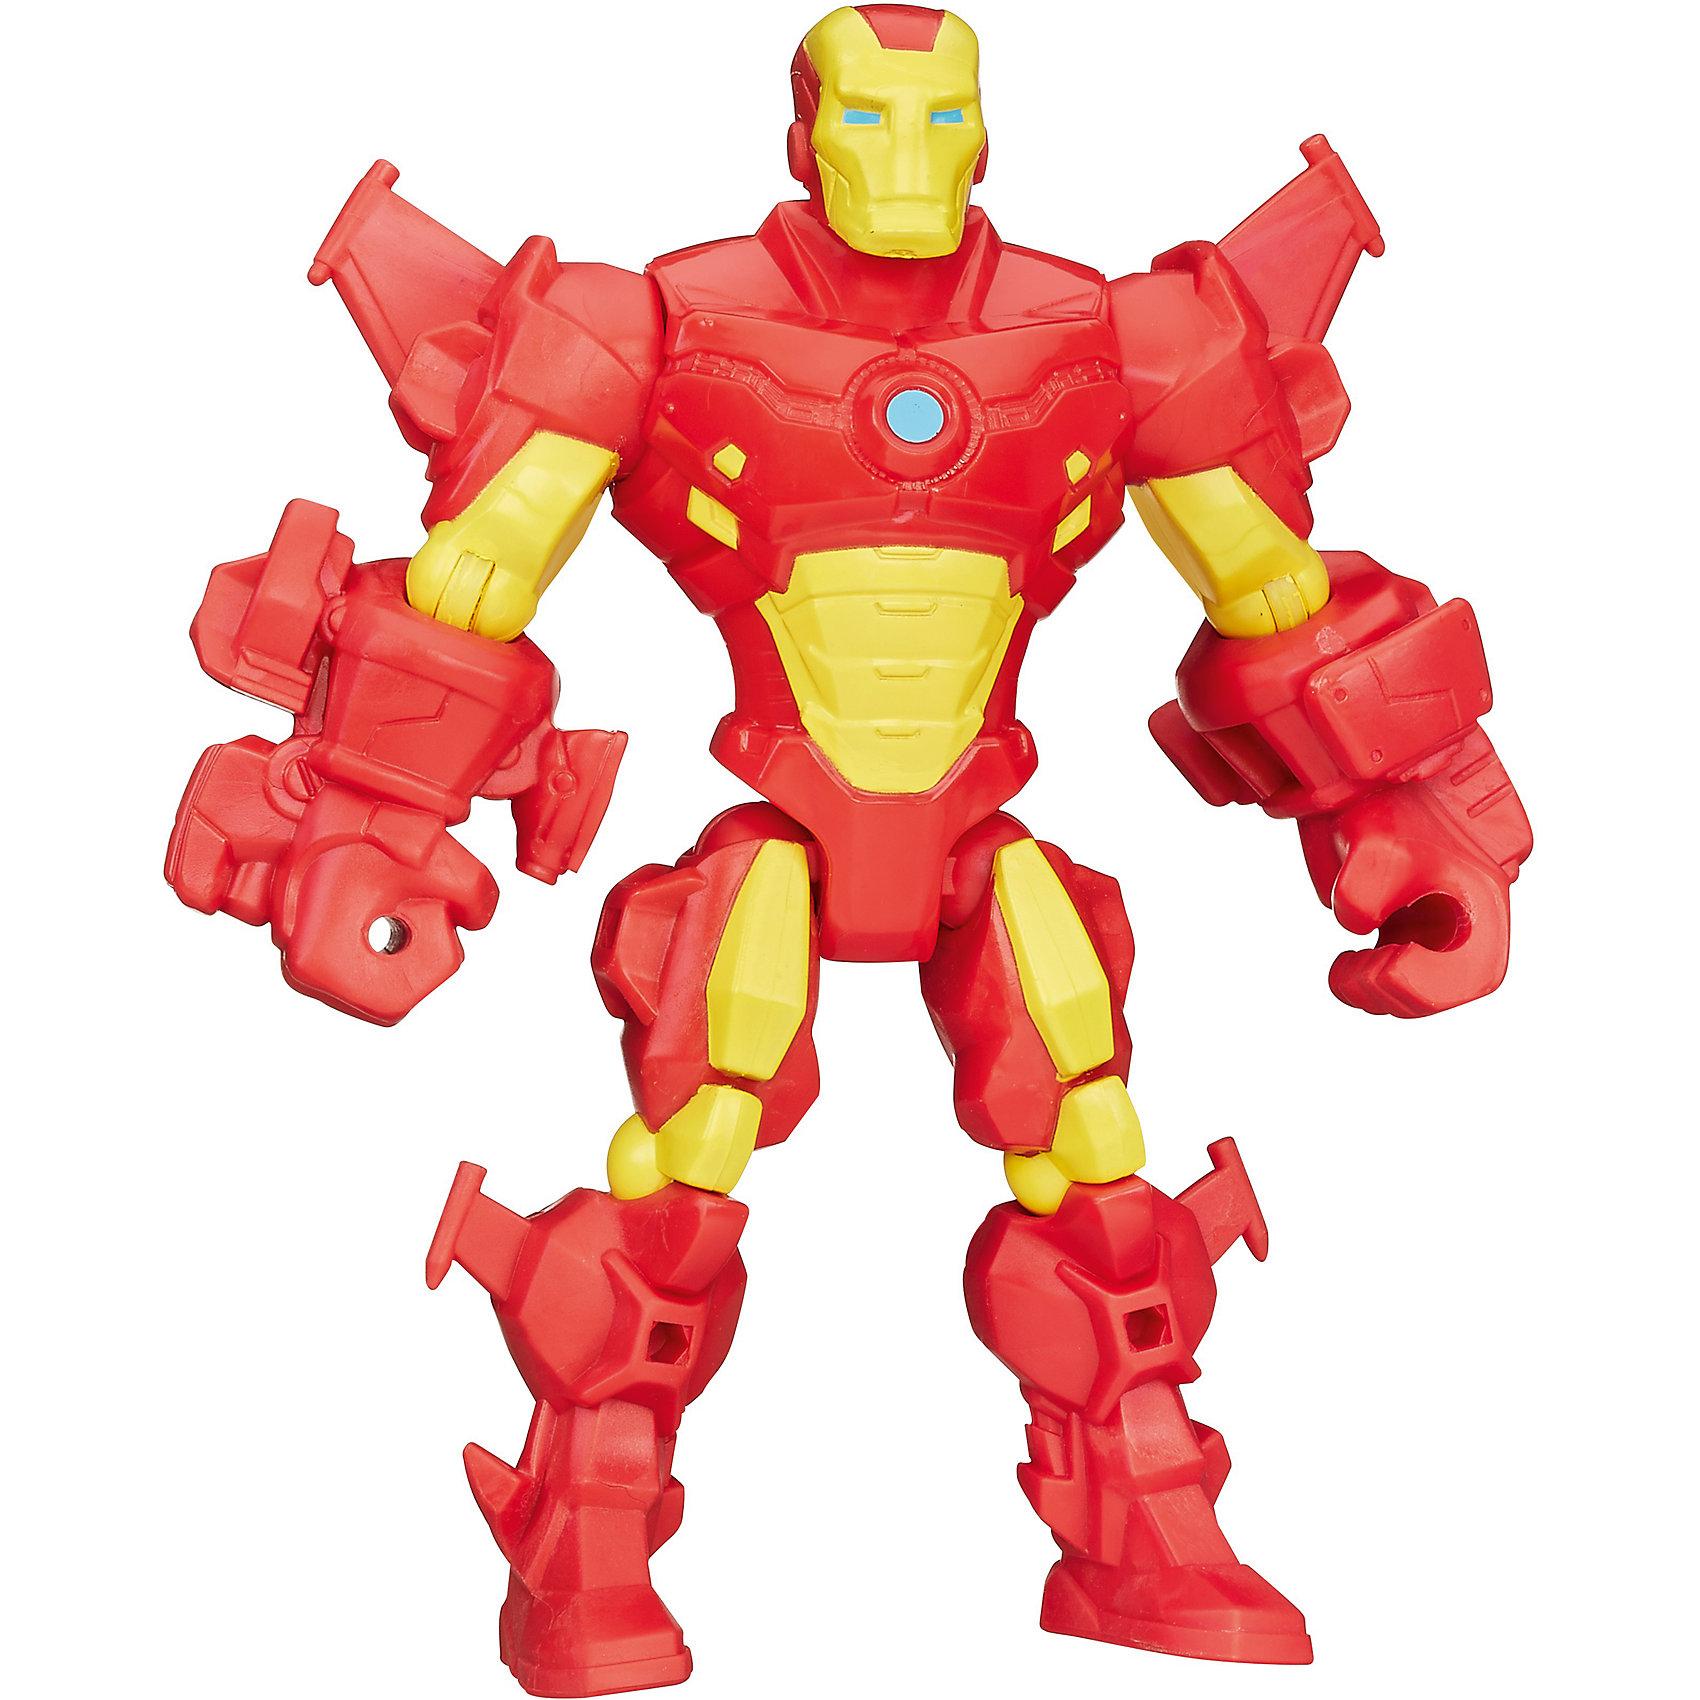 Hasbro Разборная фигурка Марвел Железный человек, Hero Mashers фигурки игрушки hasbro набор микро фигурок марвел